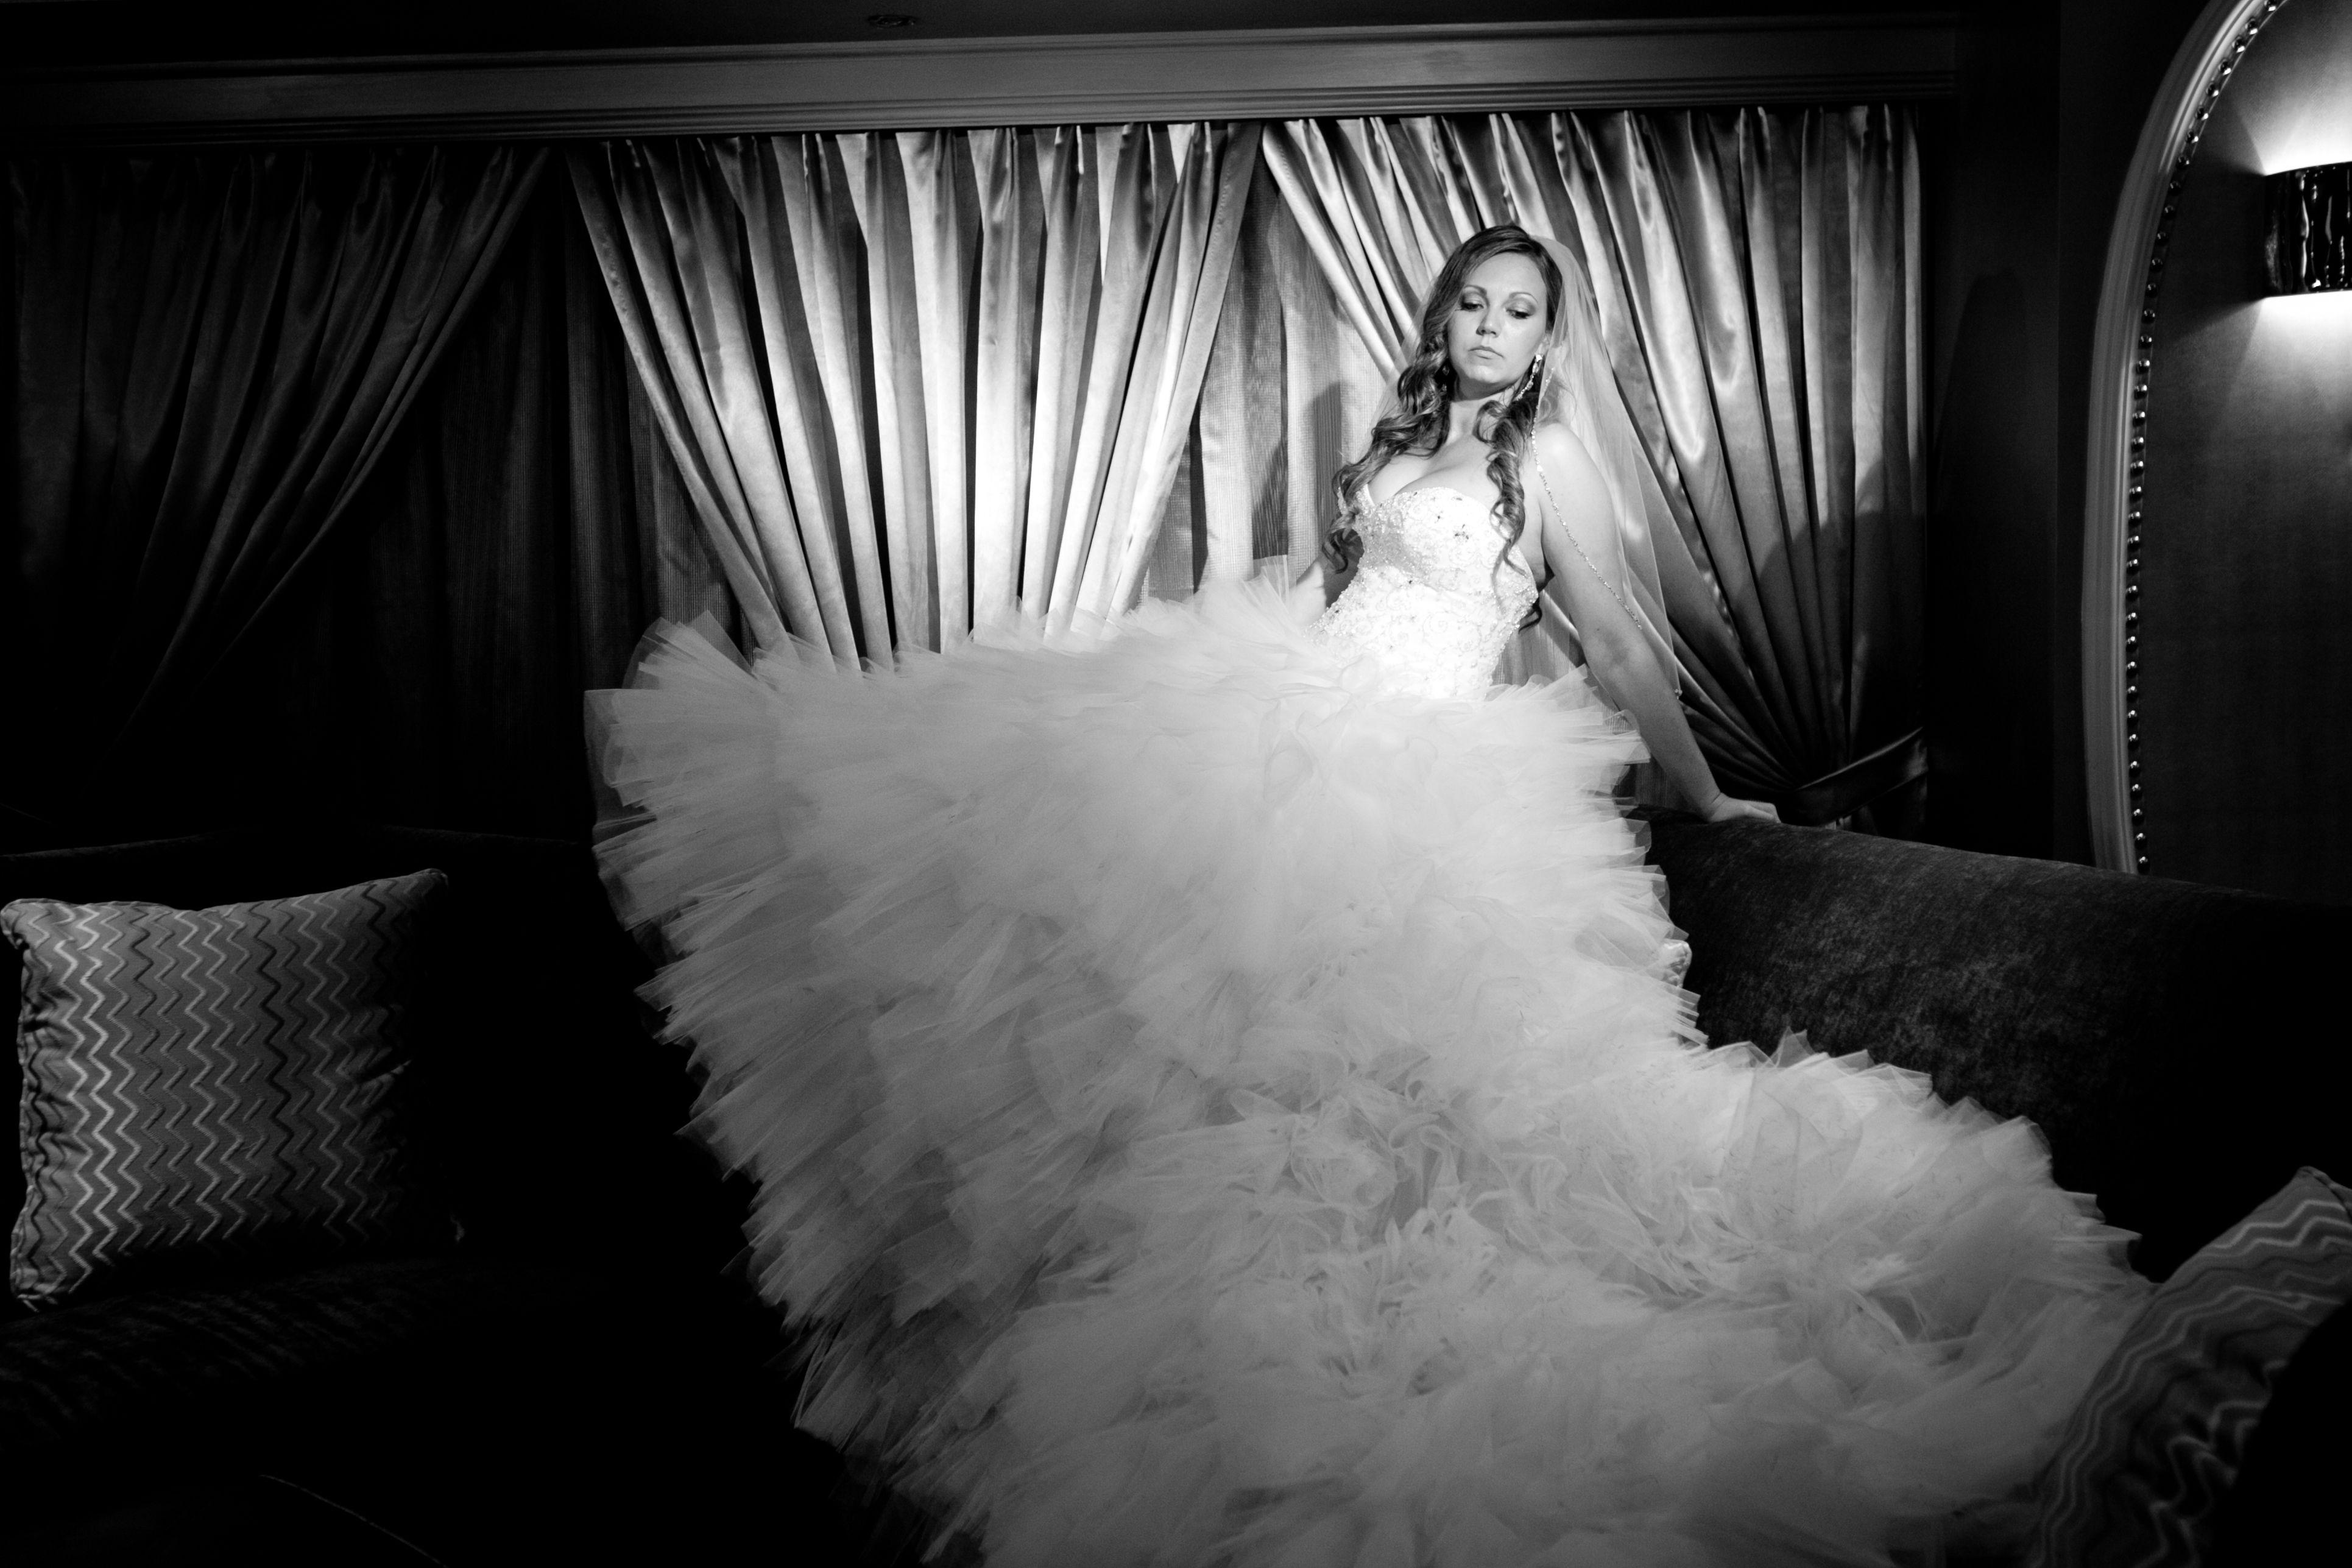 My wedding day ! @Maggie Moore Sottero #wedding #dress #weddingdress #maggiesottero